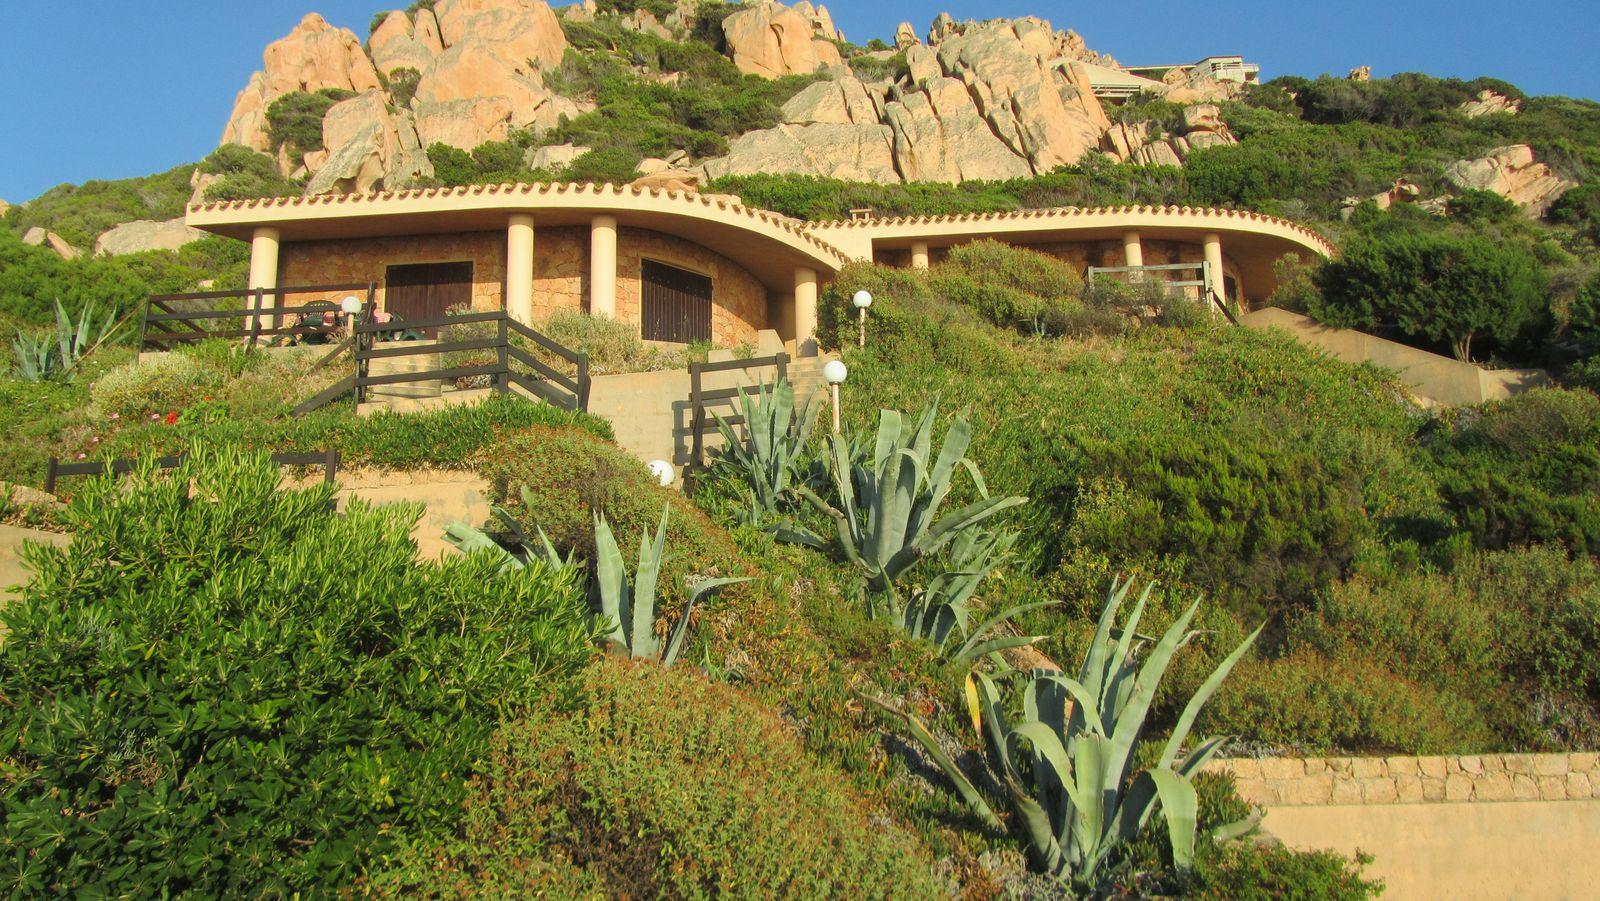 Costa Paradiso Sardegna Cartina Geografica.Lu Ciuoni Panorama Eccezionale Costa Paradiso Sardegna